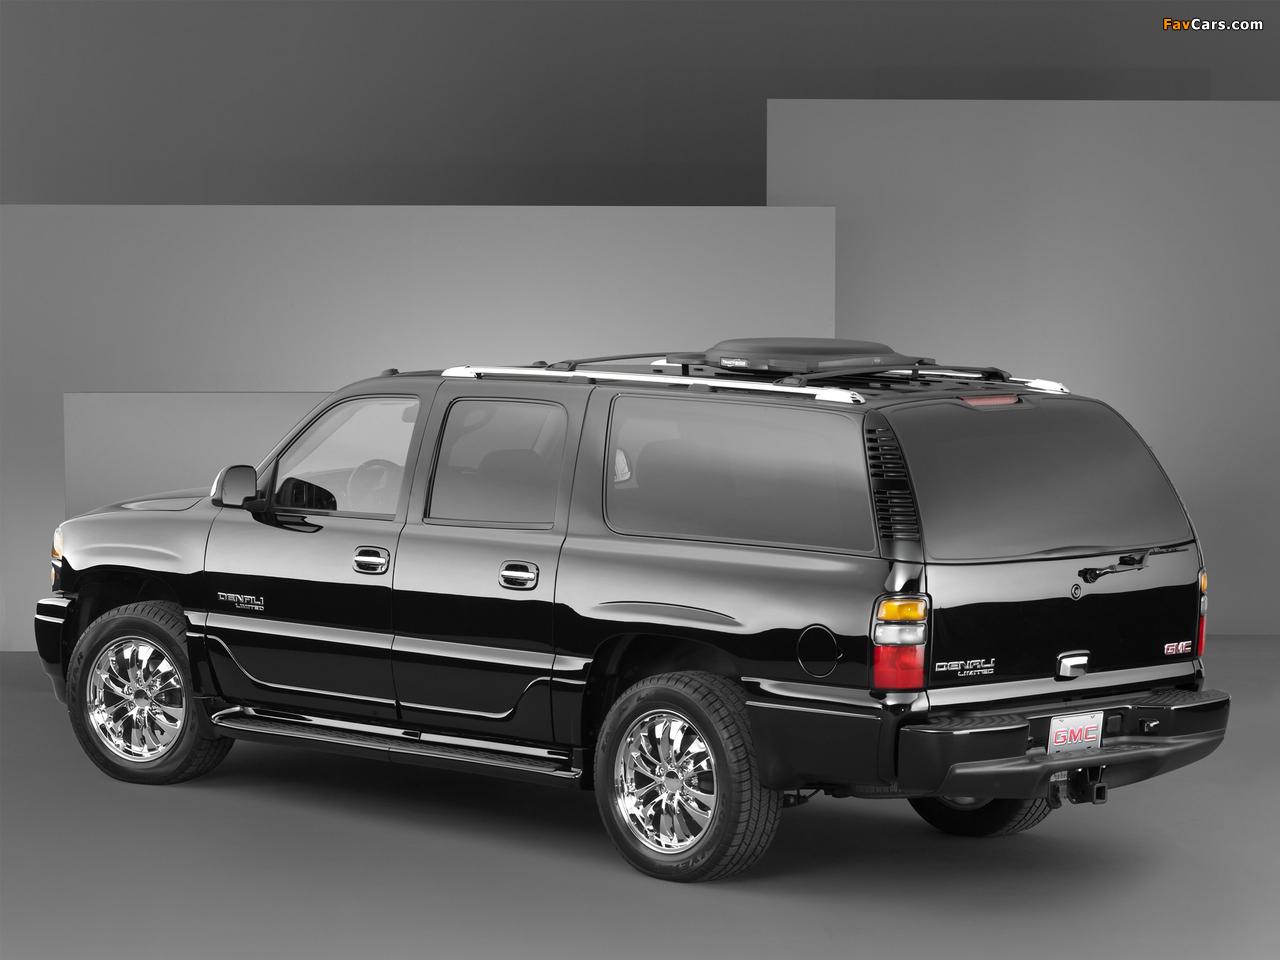 GMC Yukon XL Denali Limited Edition Concept 2004 photos (1280 x 960)